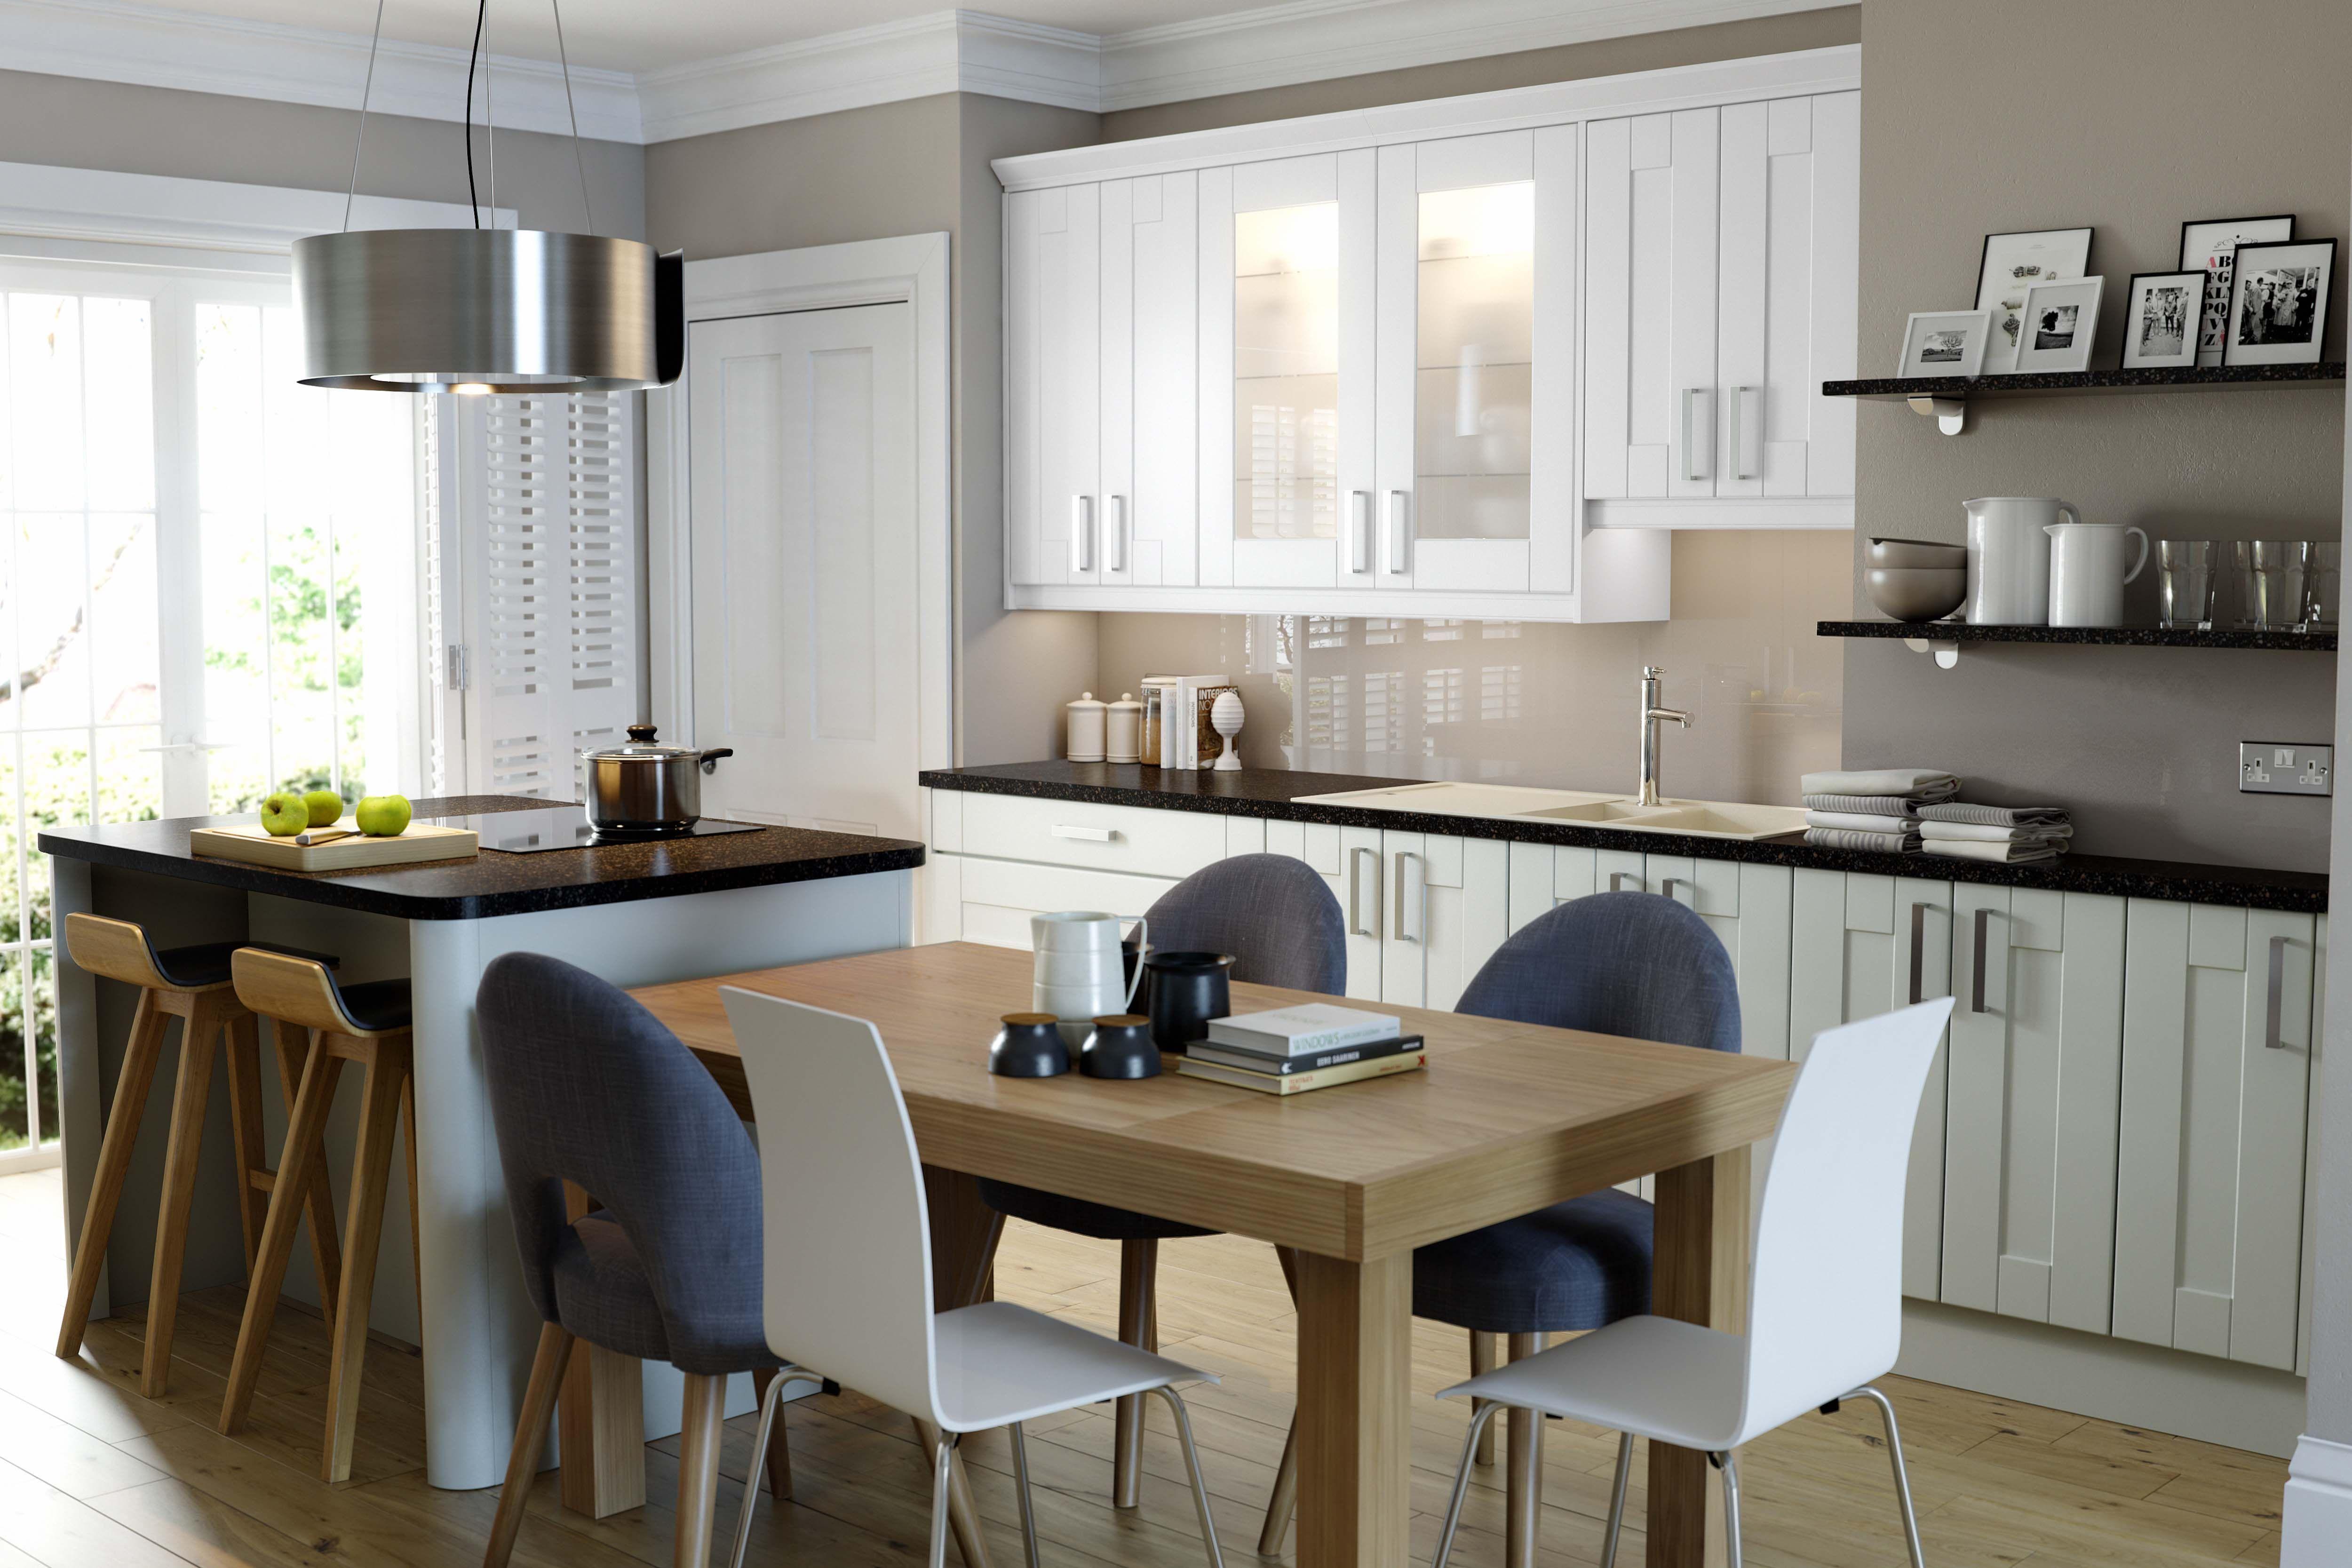 Wren Kitchens Shaker Ermine French Partridge New for